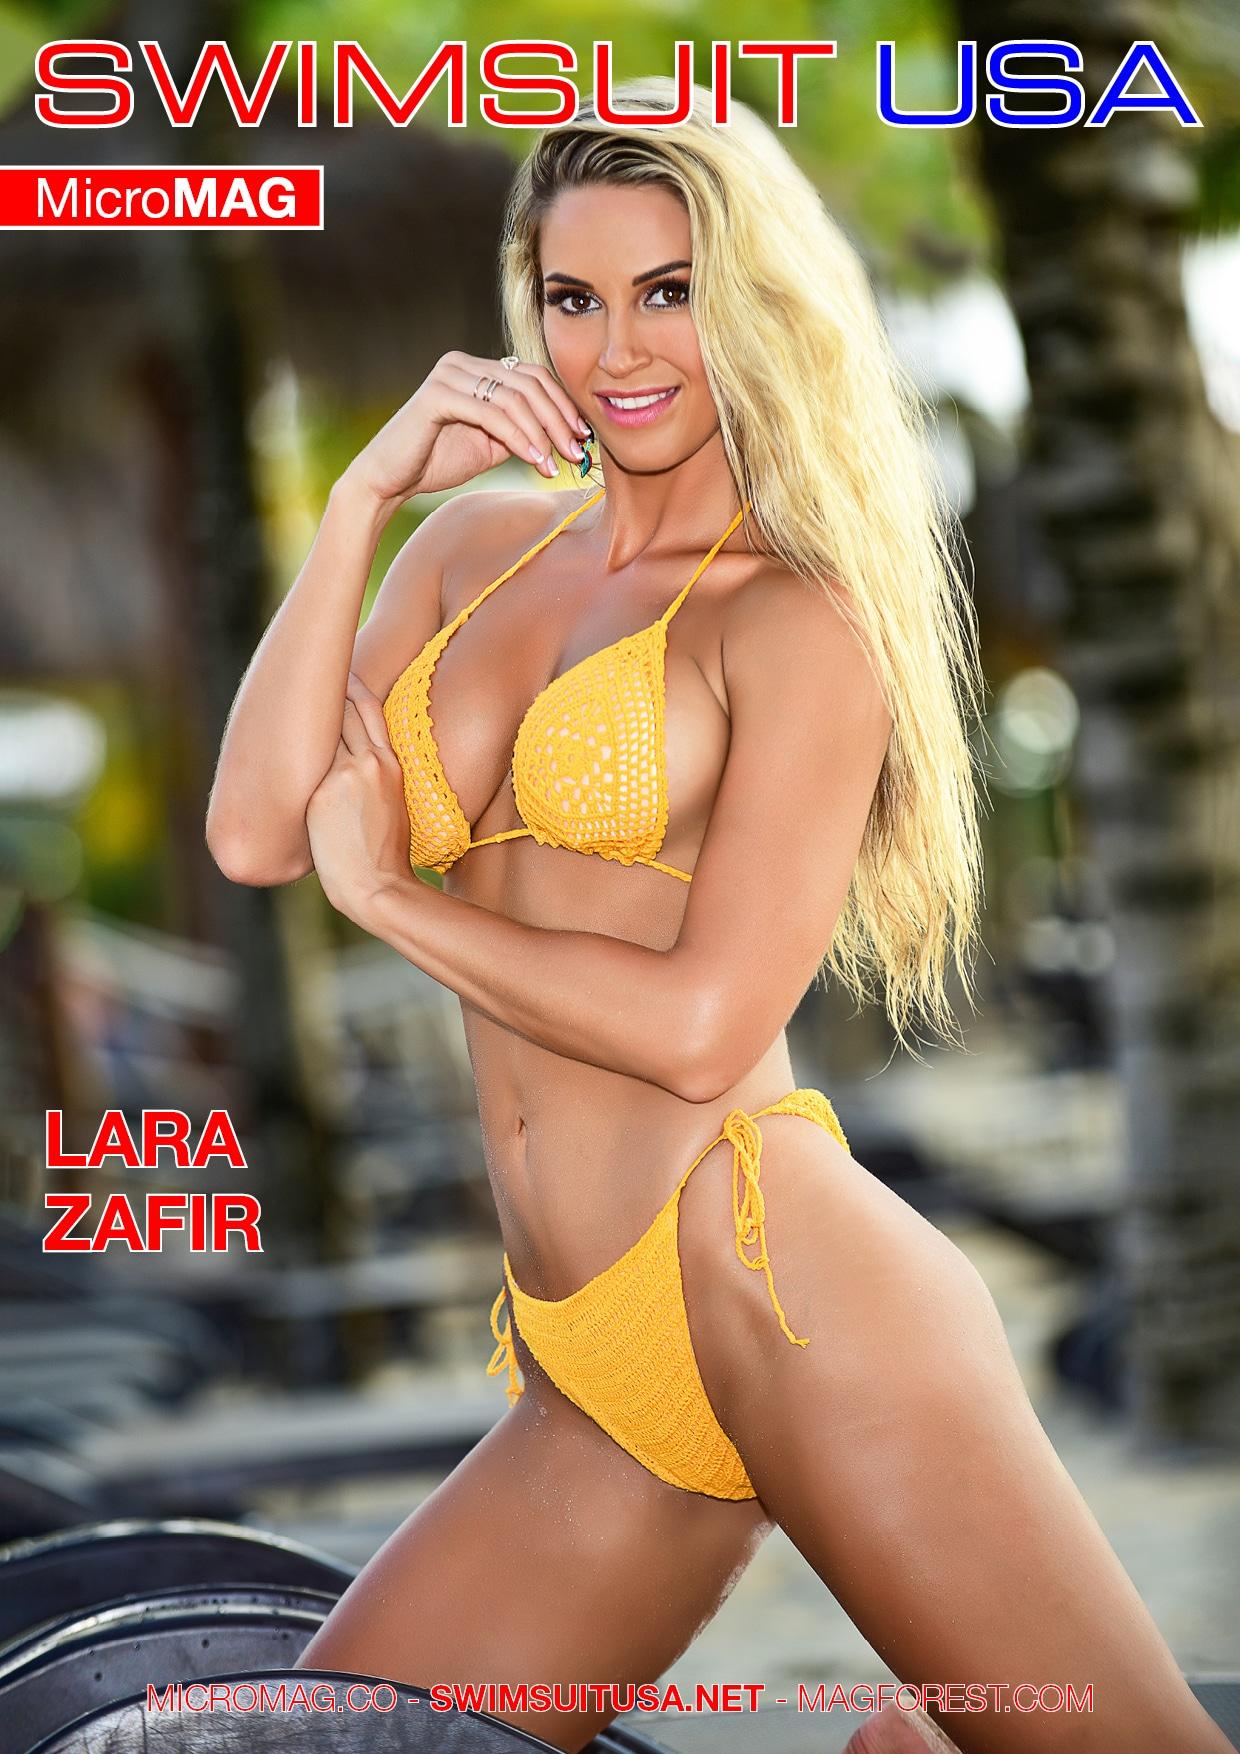 Swimsuit USA MicroMAG - Lara Zafir 4